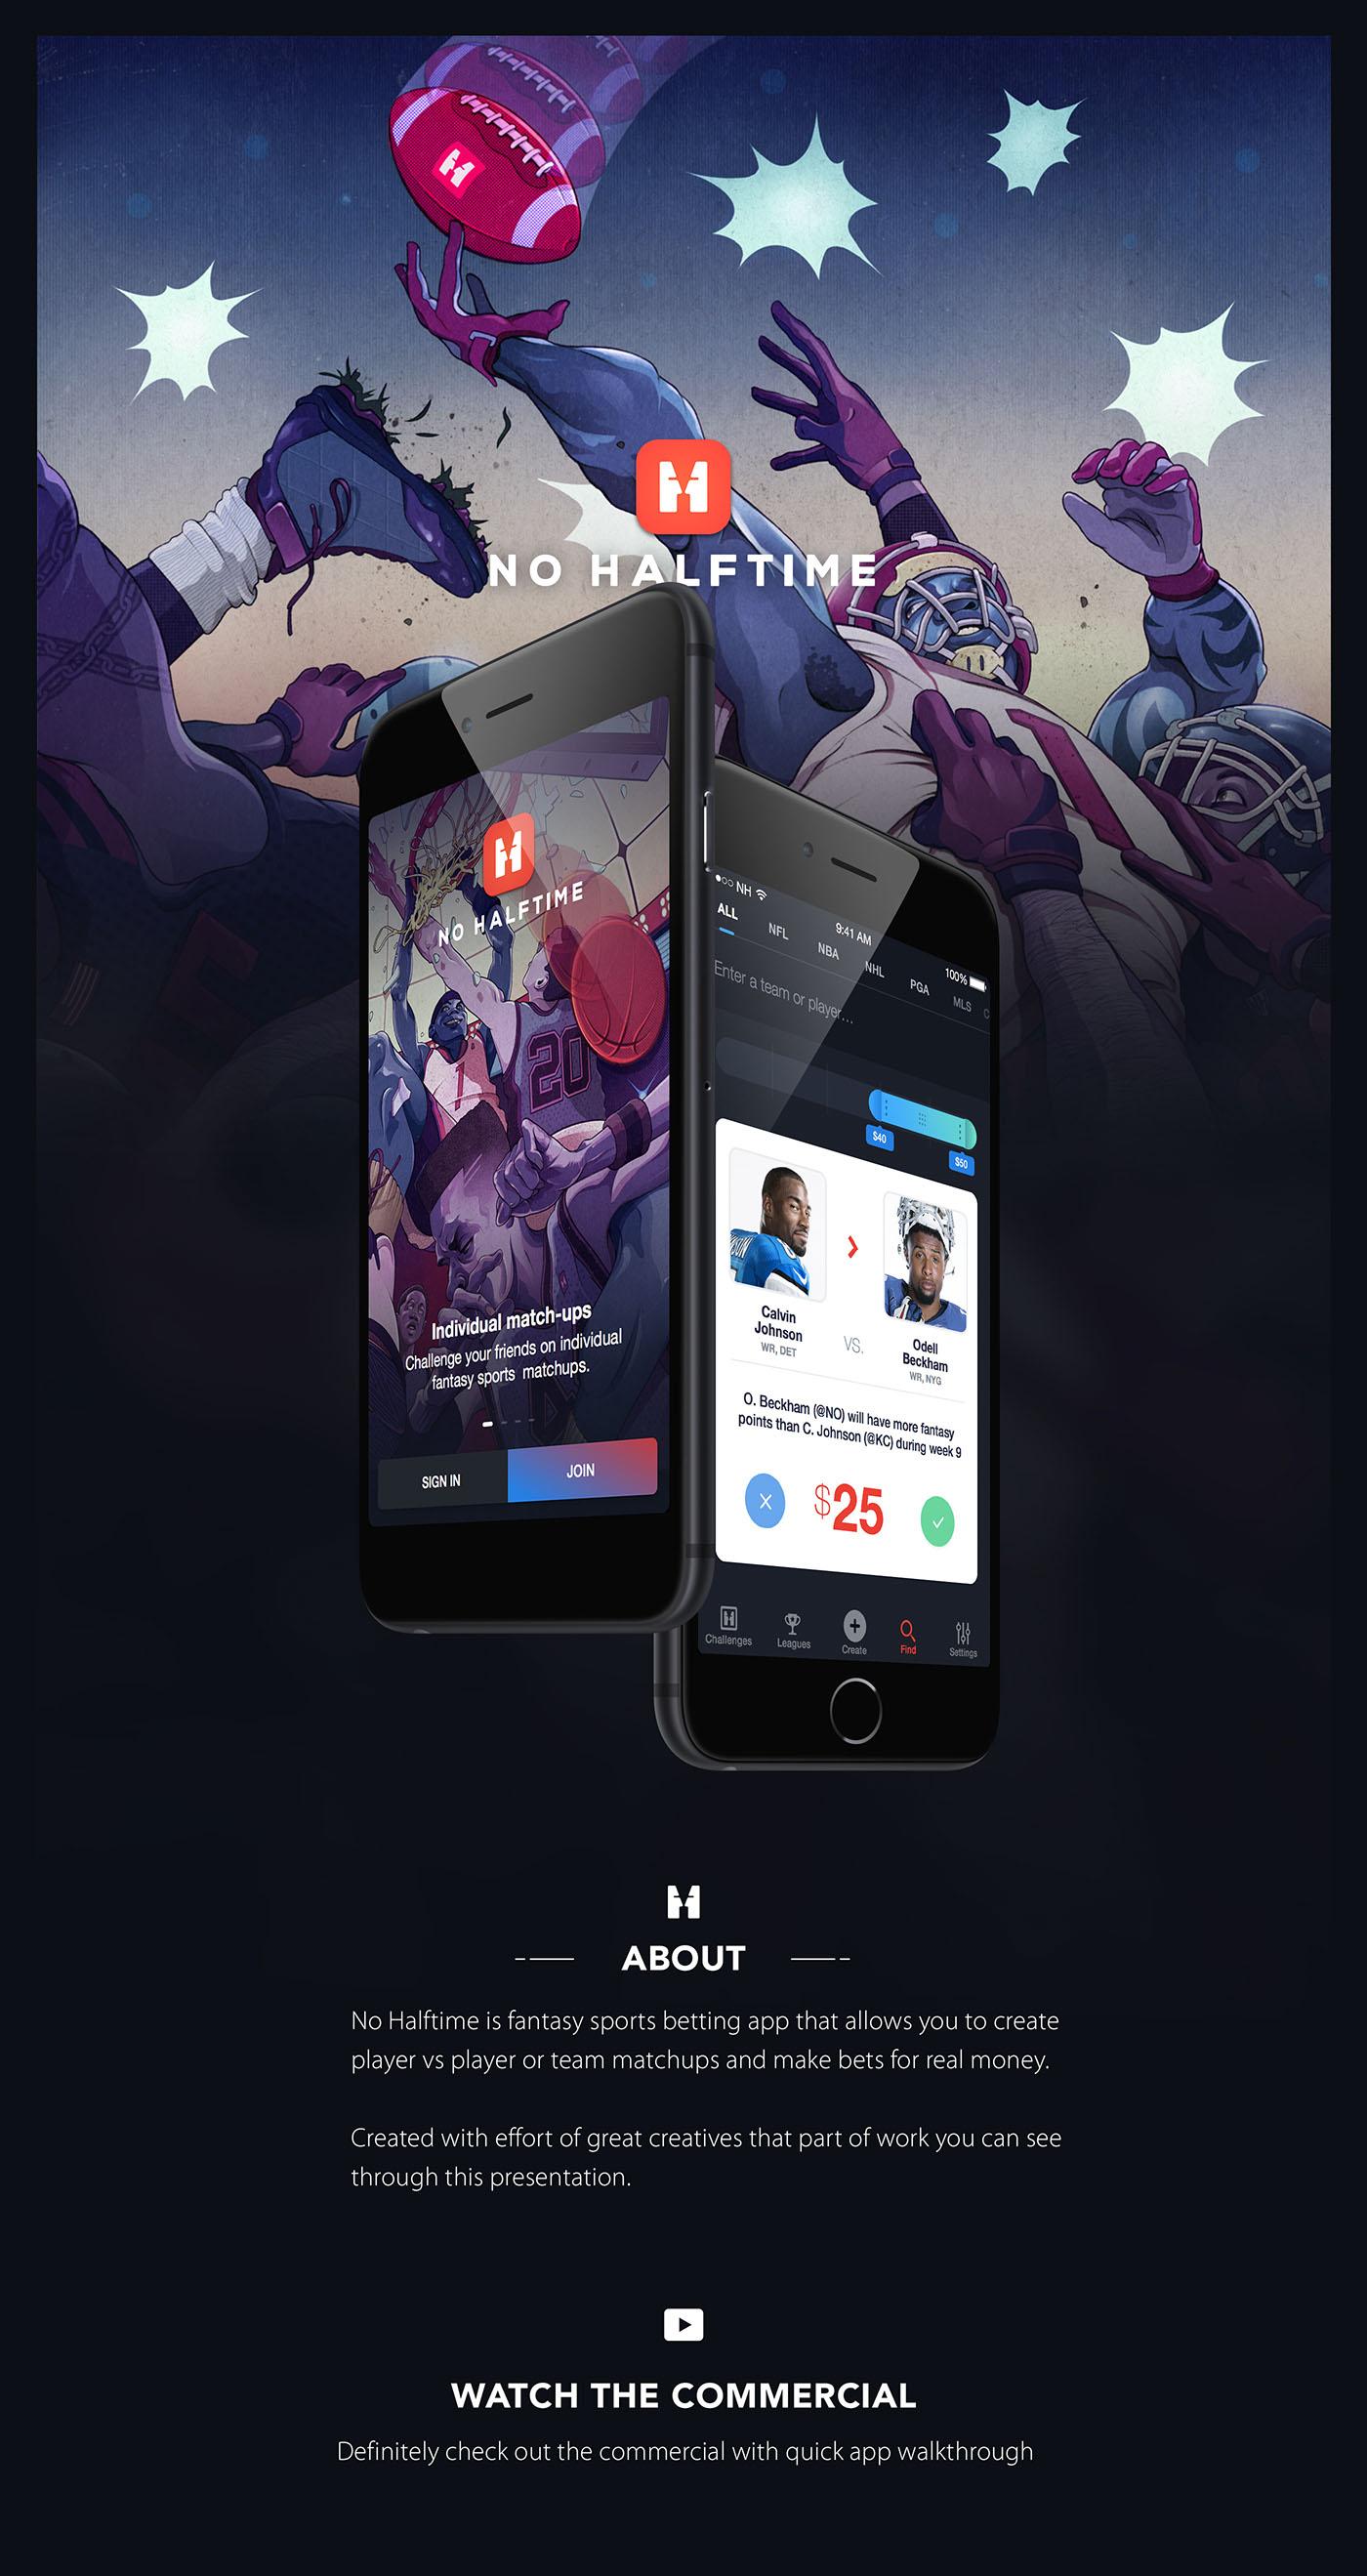 Adobe Portfolio app UI sport bet matchup fantasy sports cards samborek sambora no halftime interaction betting